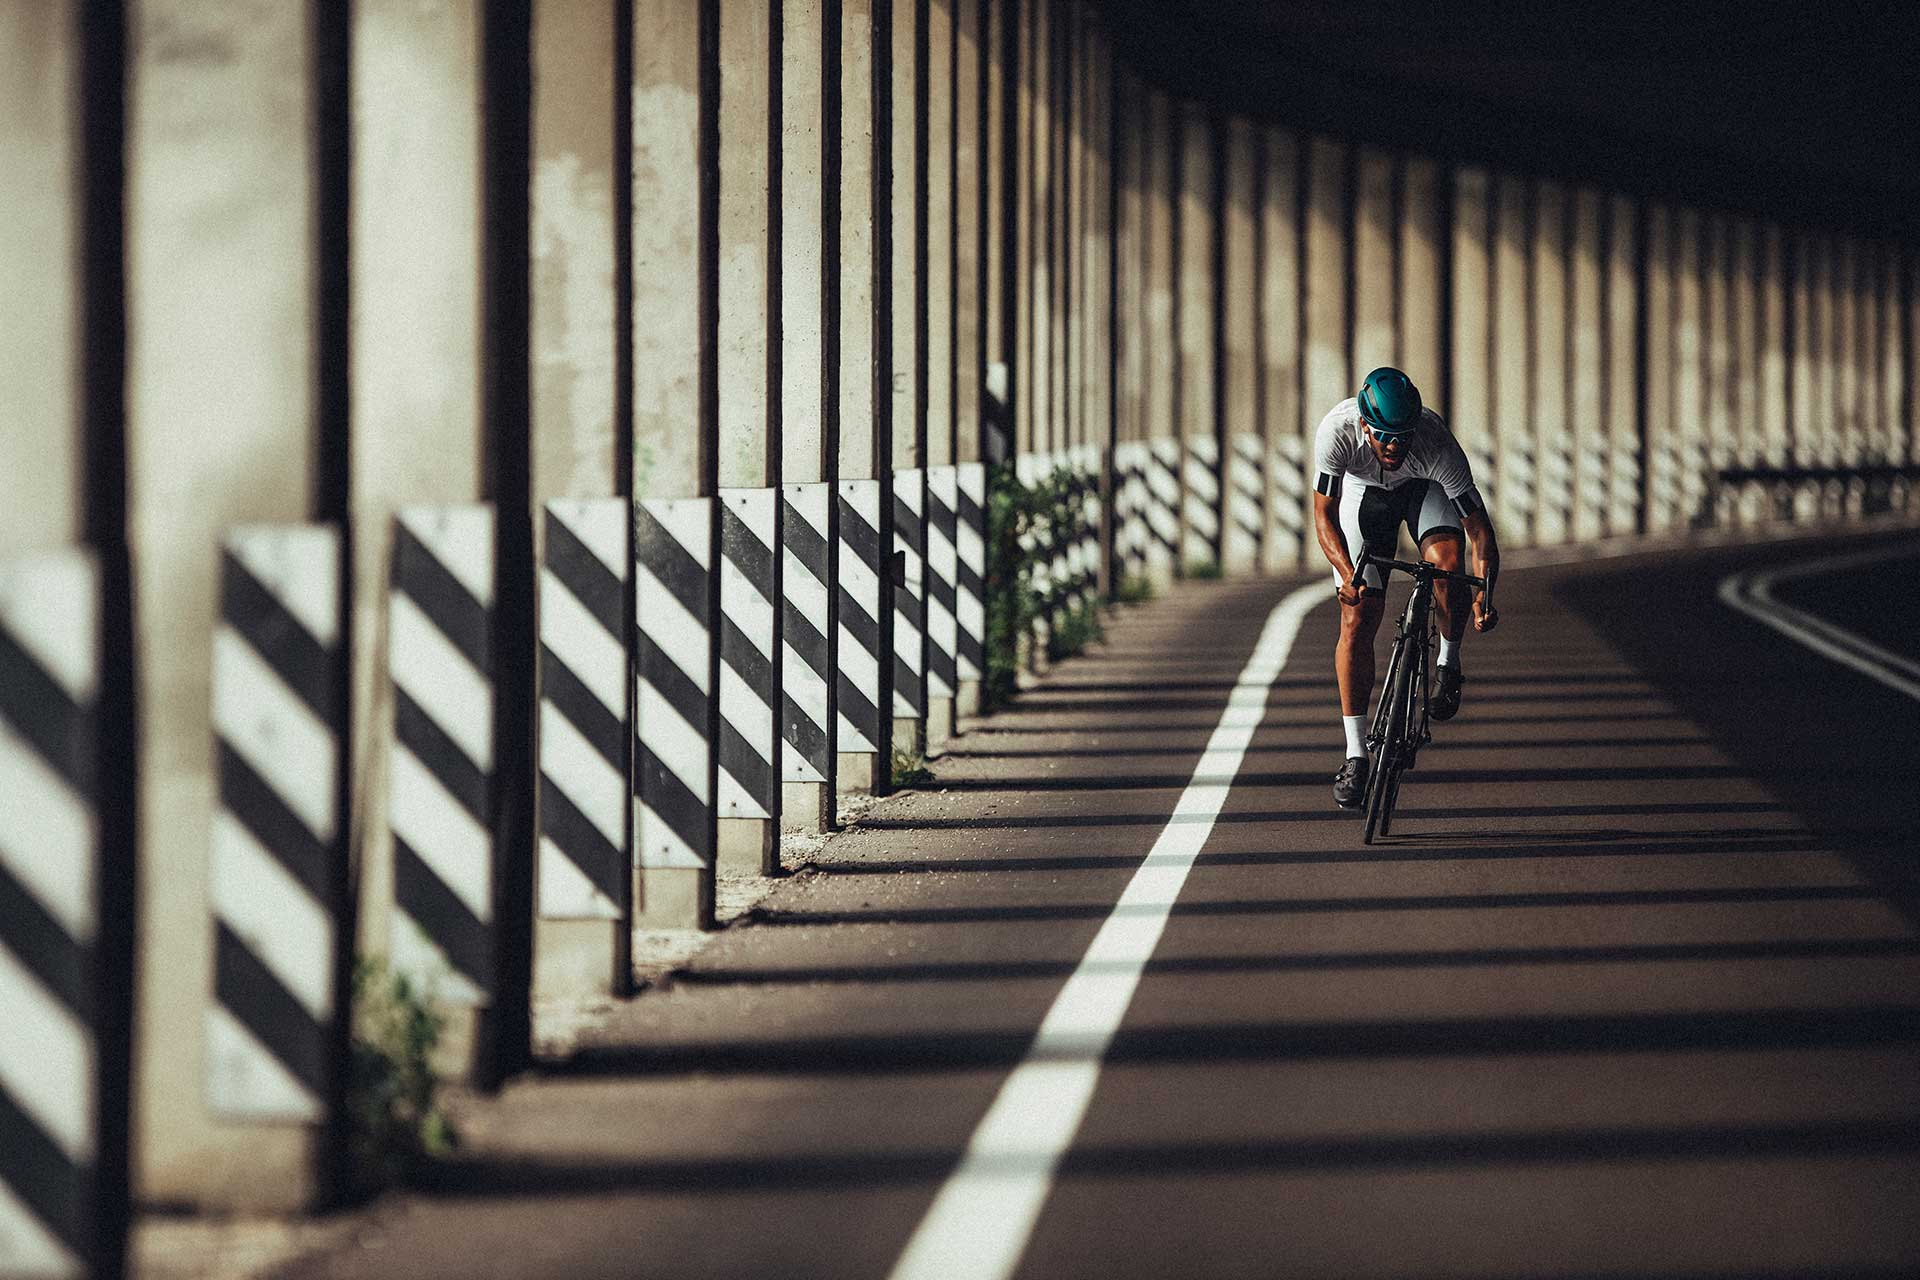 Abus Fahrradhelm Sport Rennrad Fotograf Aktion Outdoor Michael Müller London